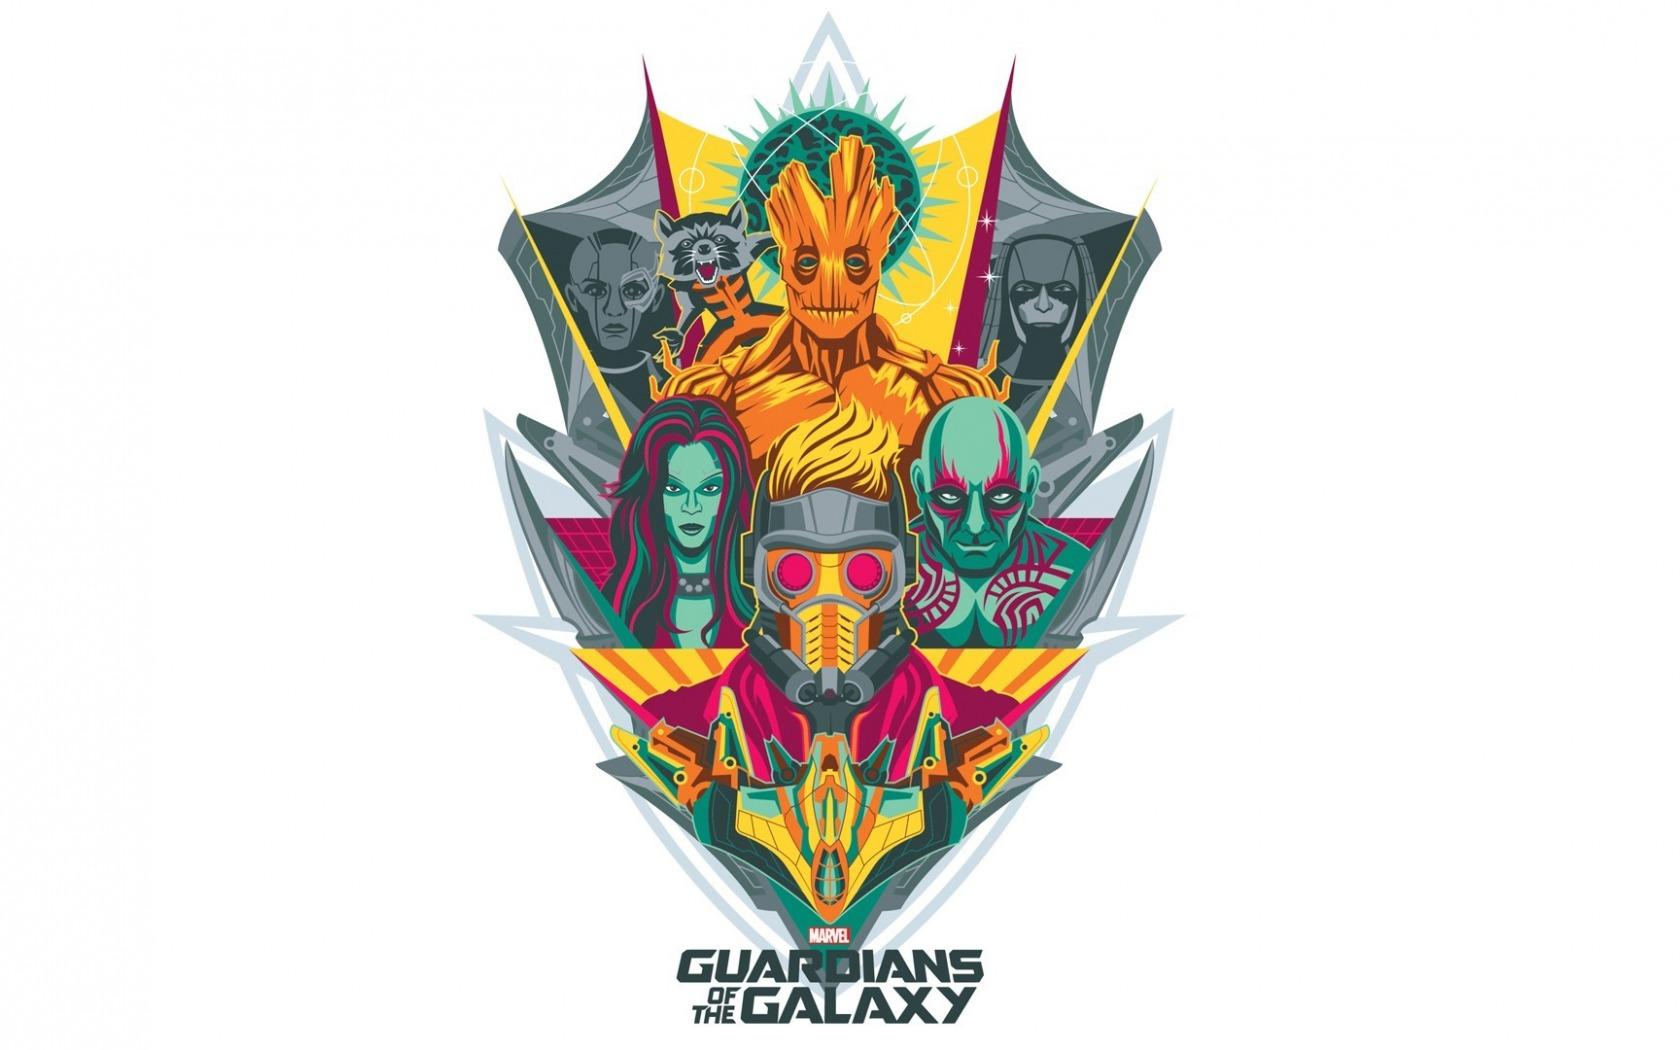 Wallpaper : illustration, logo, Gamora, Guardians of the.